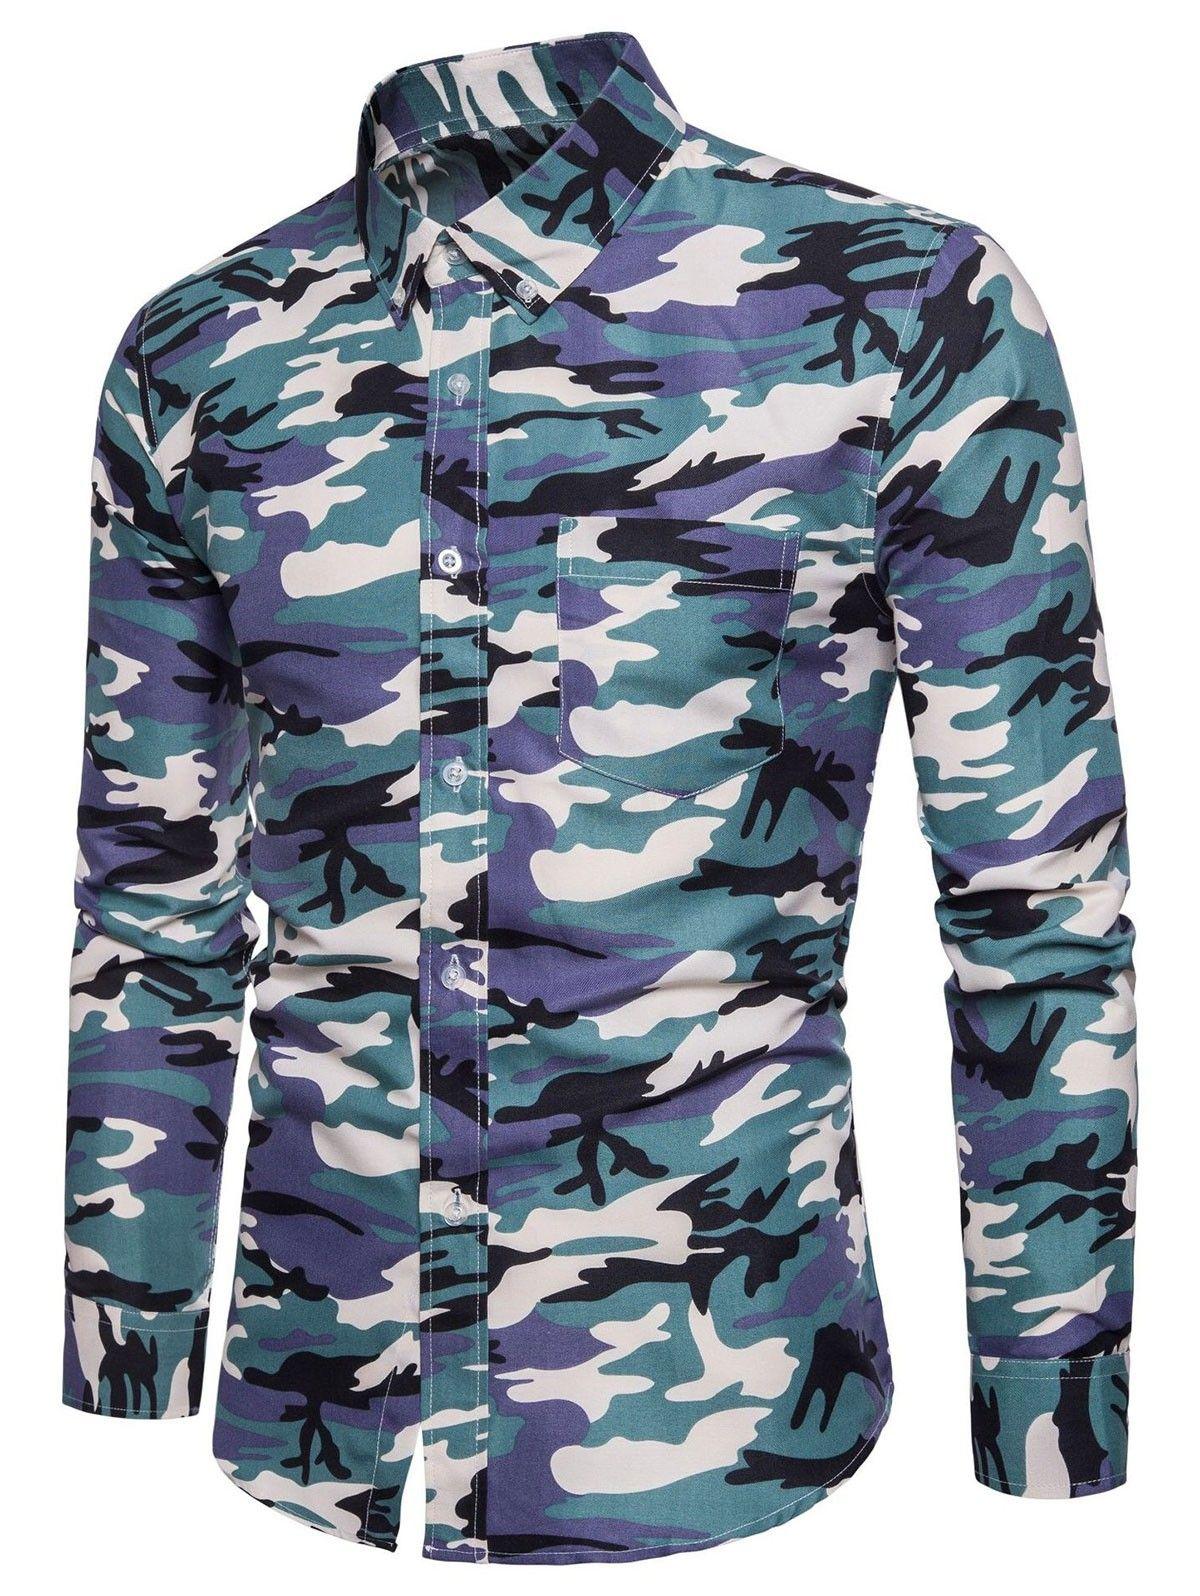 Rrive Mens Slim Fit Printing Long Sleeve Button Down Casual Shirt Shirts